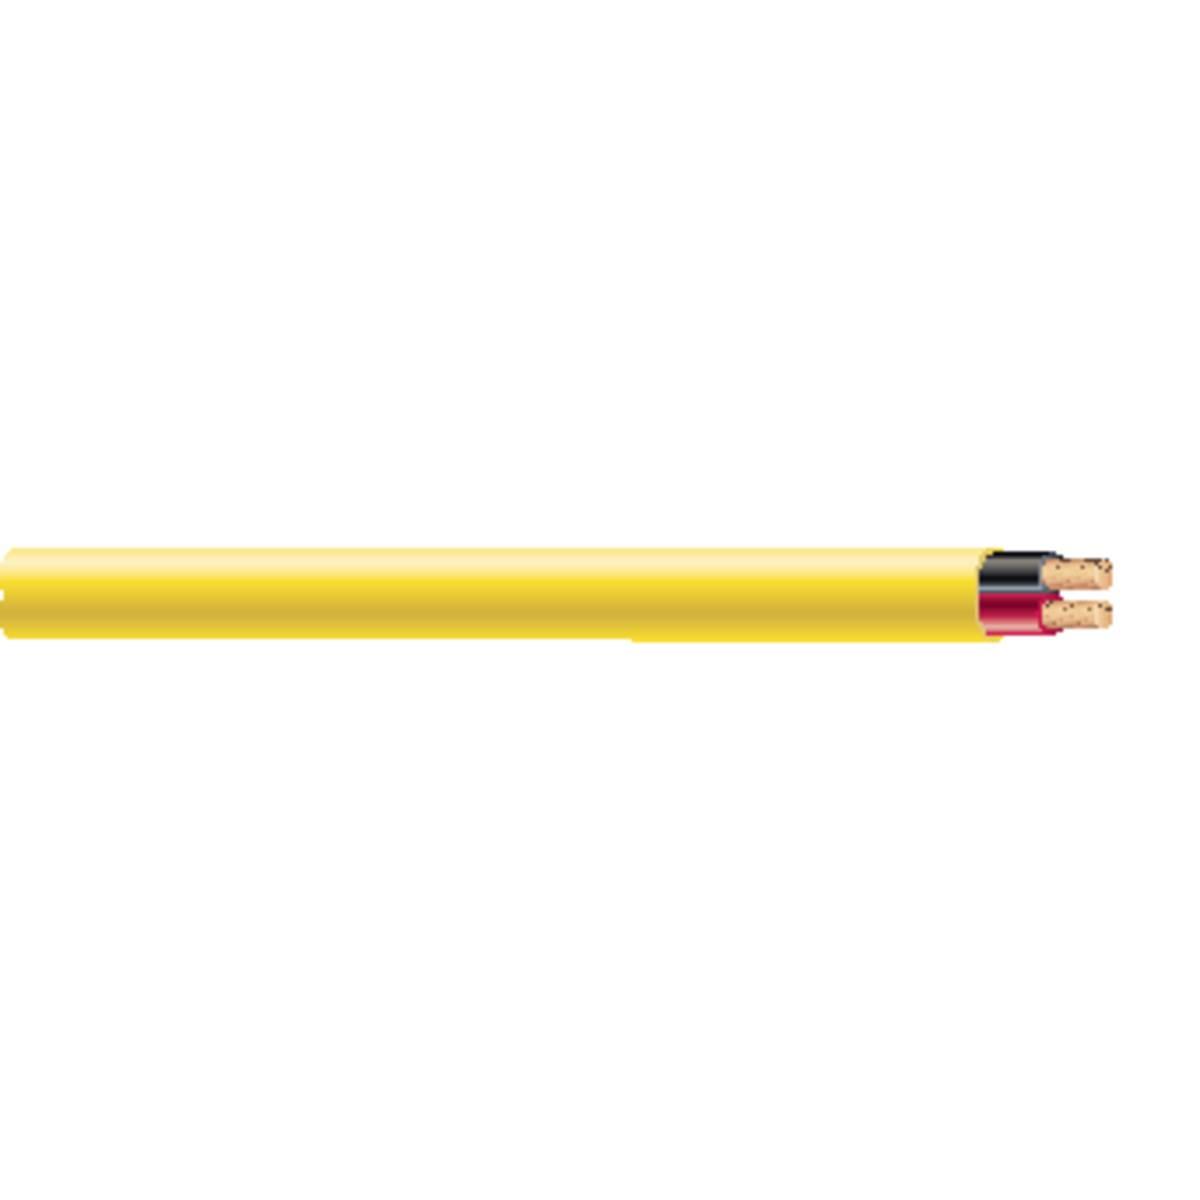 Southwire Company, LLC,947424502,AV 14/2C 105/S PRO SPK CL3 YW 500BX